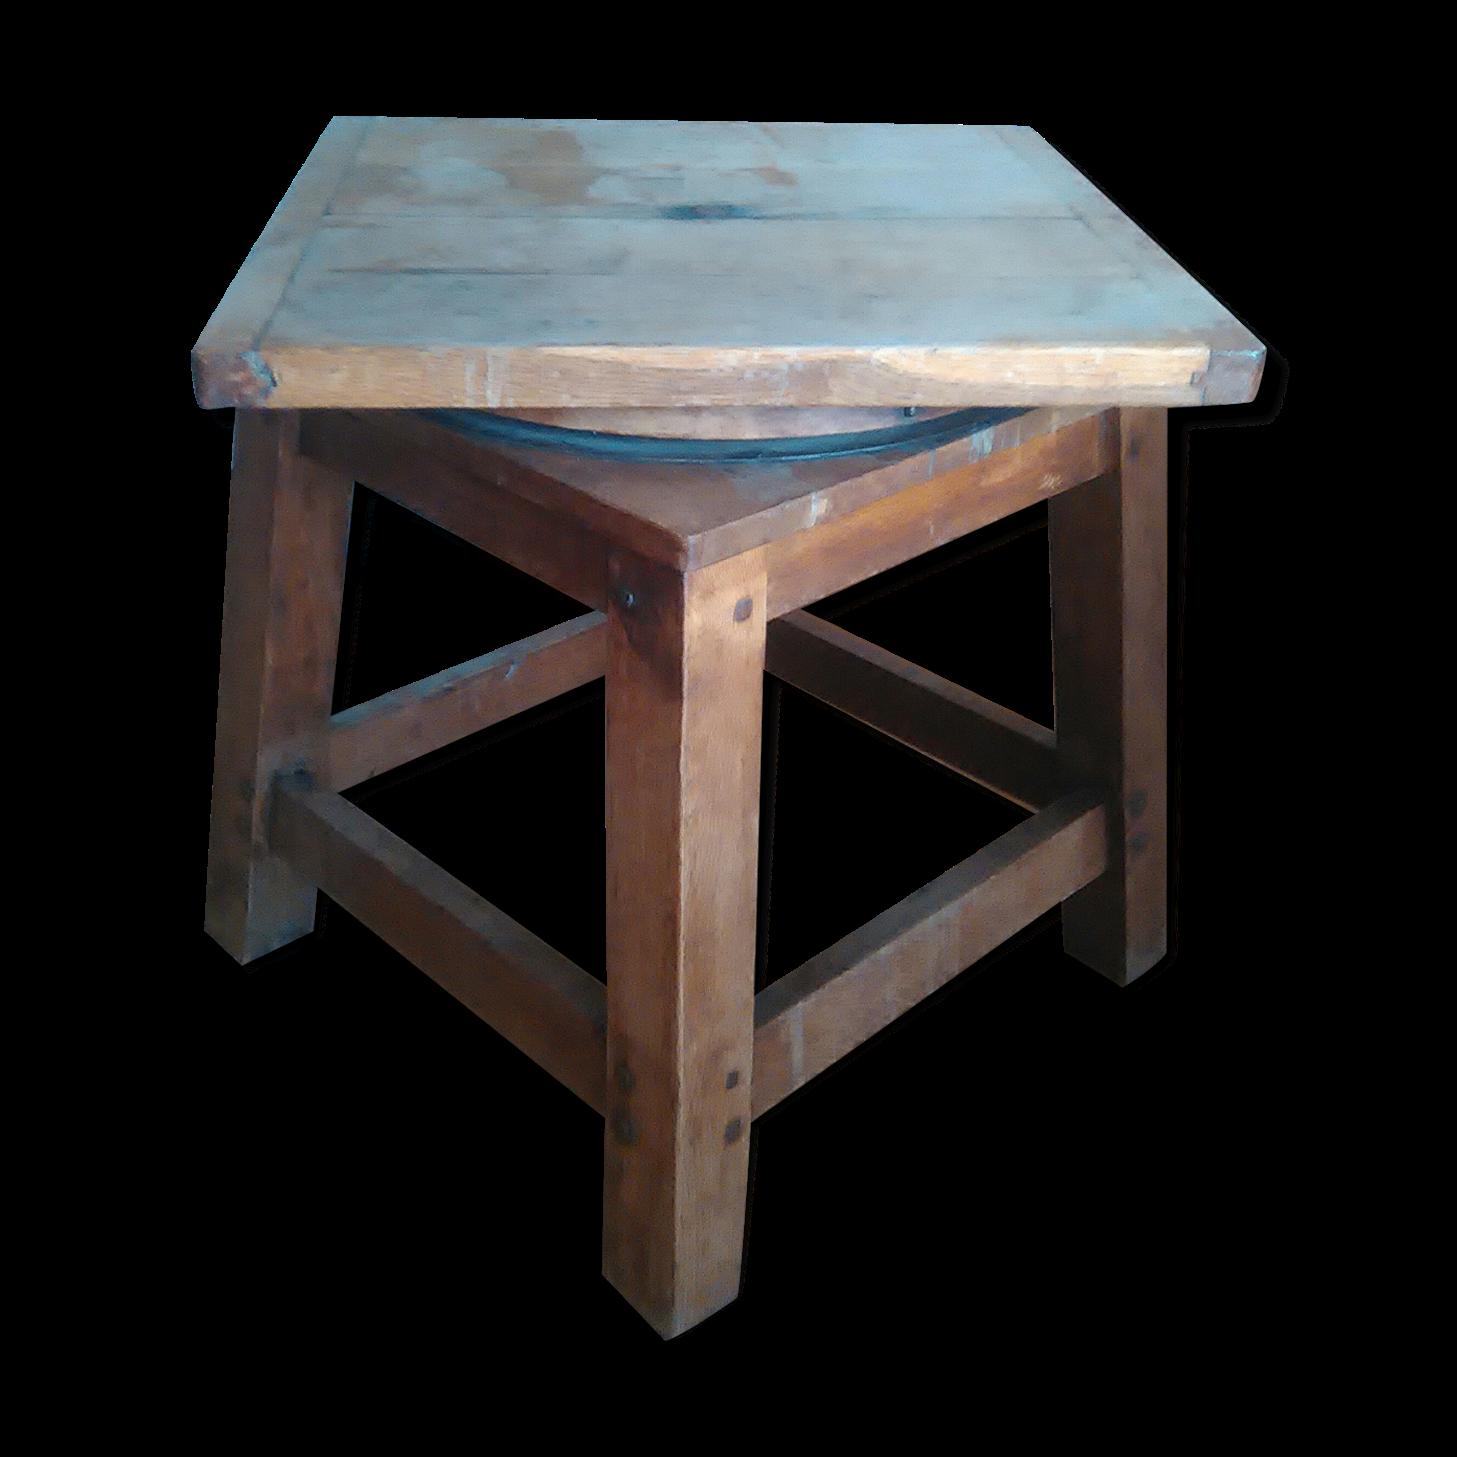 table ronde teck plateau tournant perfect table sophie en eucalyptus finition imitation teck. Black Bedroom Furniture Sets. Home Design Ideas